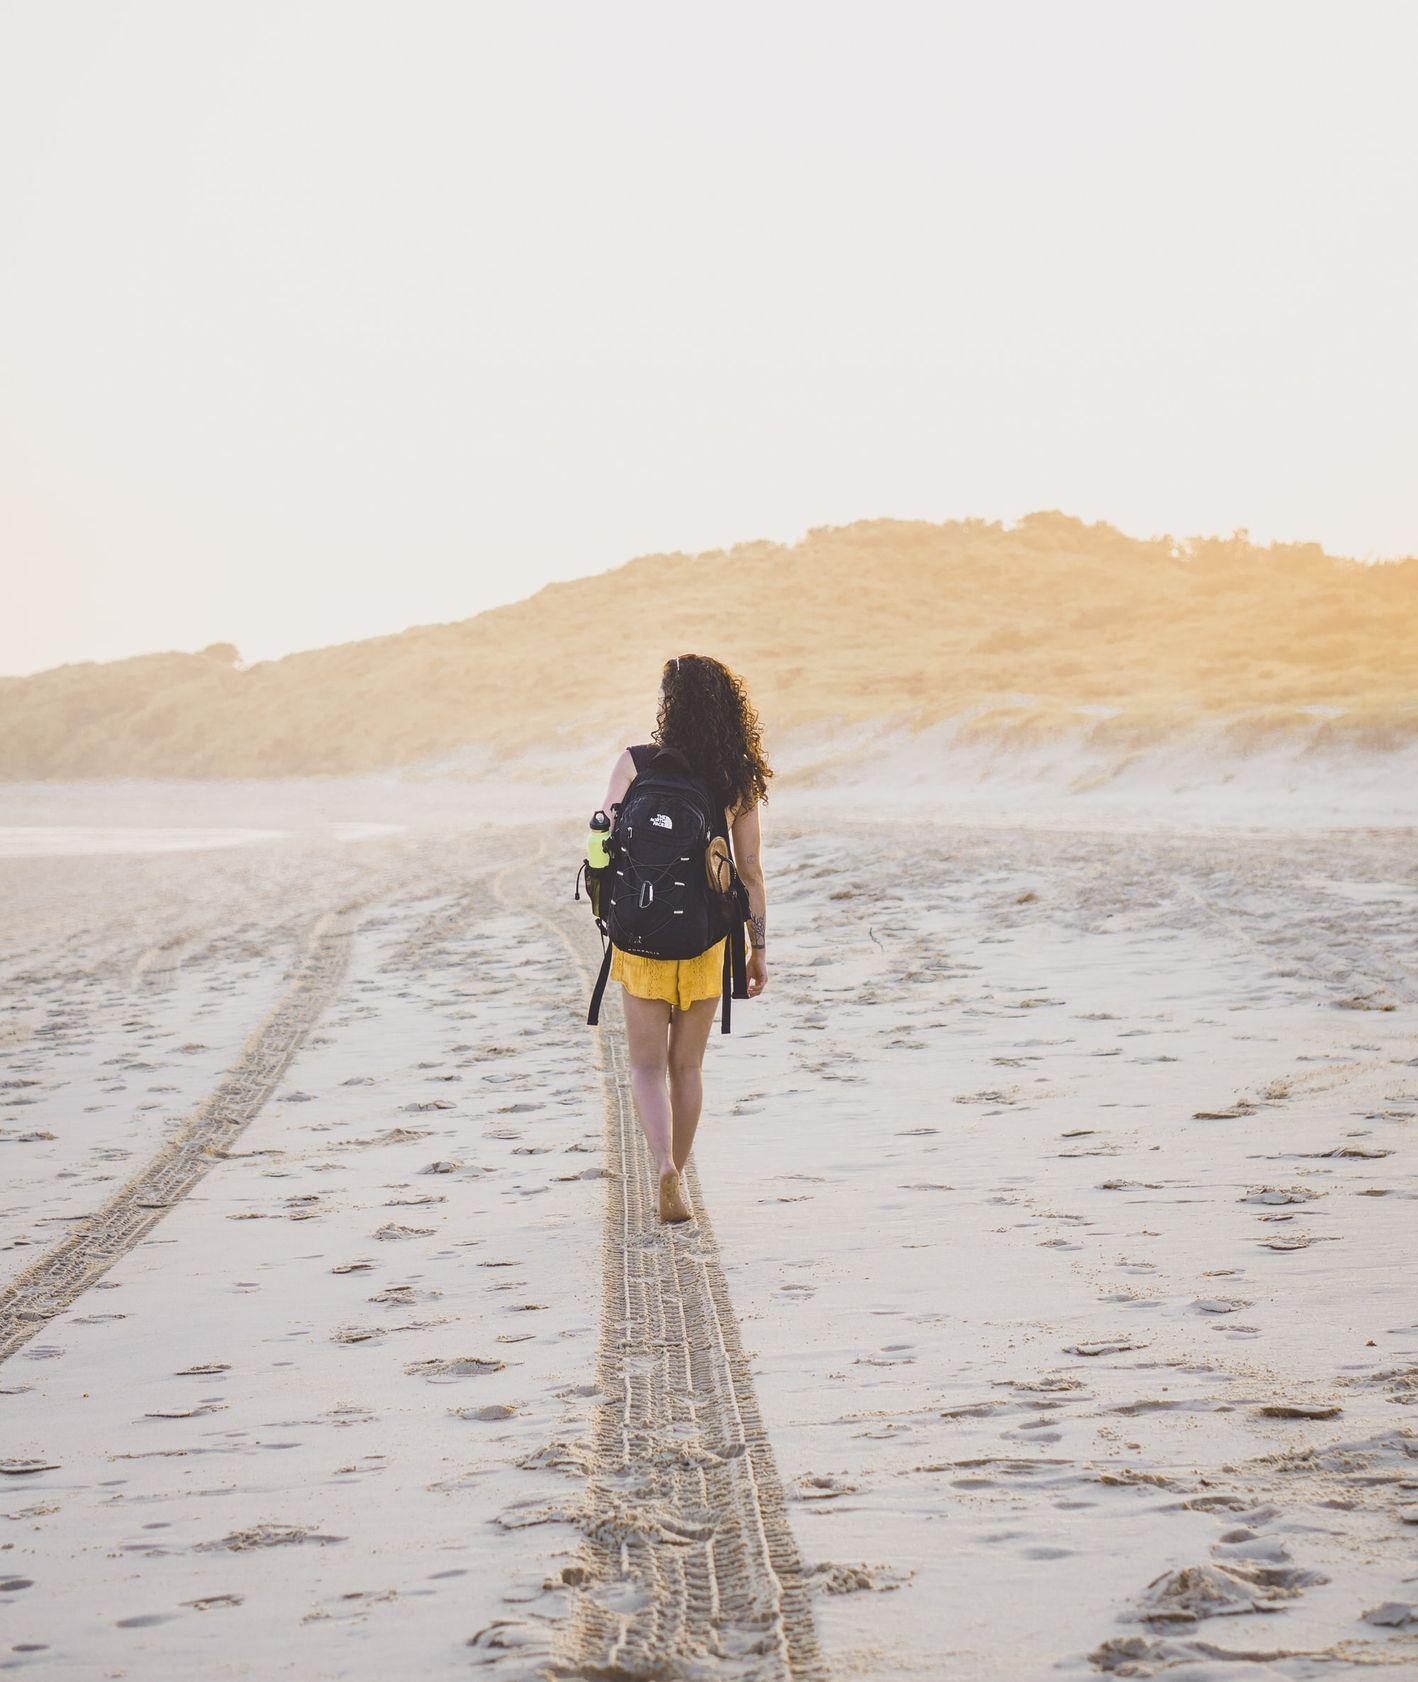 Kobieta z plecakiem idąca plażą (fot. Amy Fraser / unsplash.com)